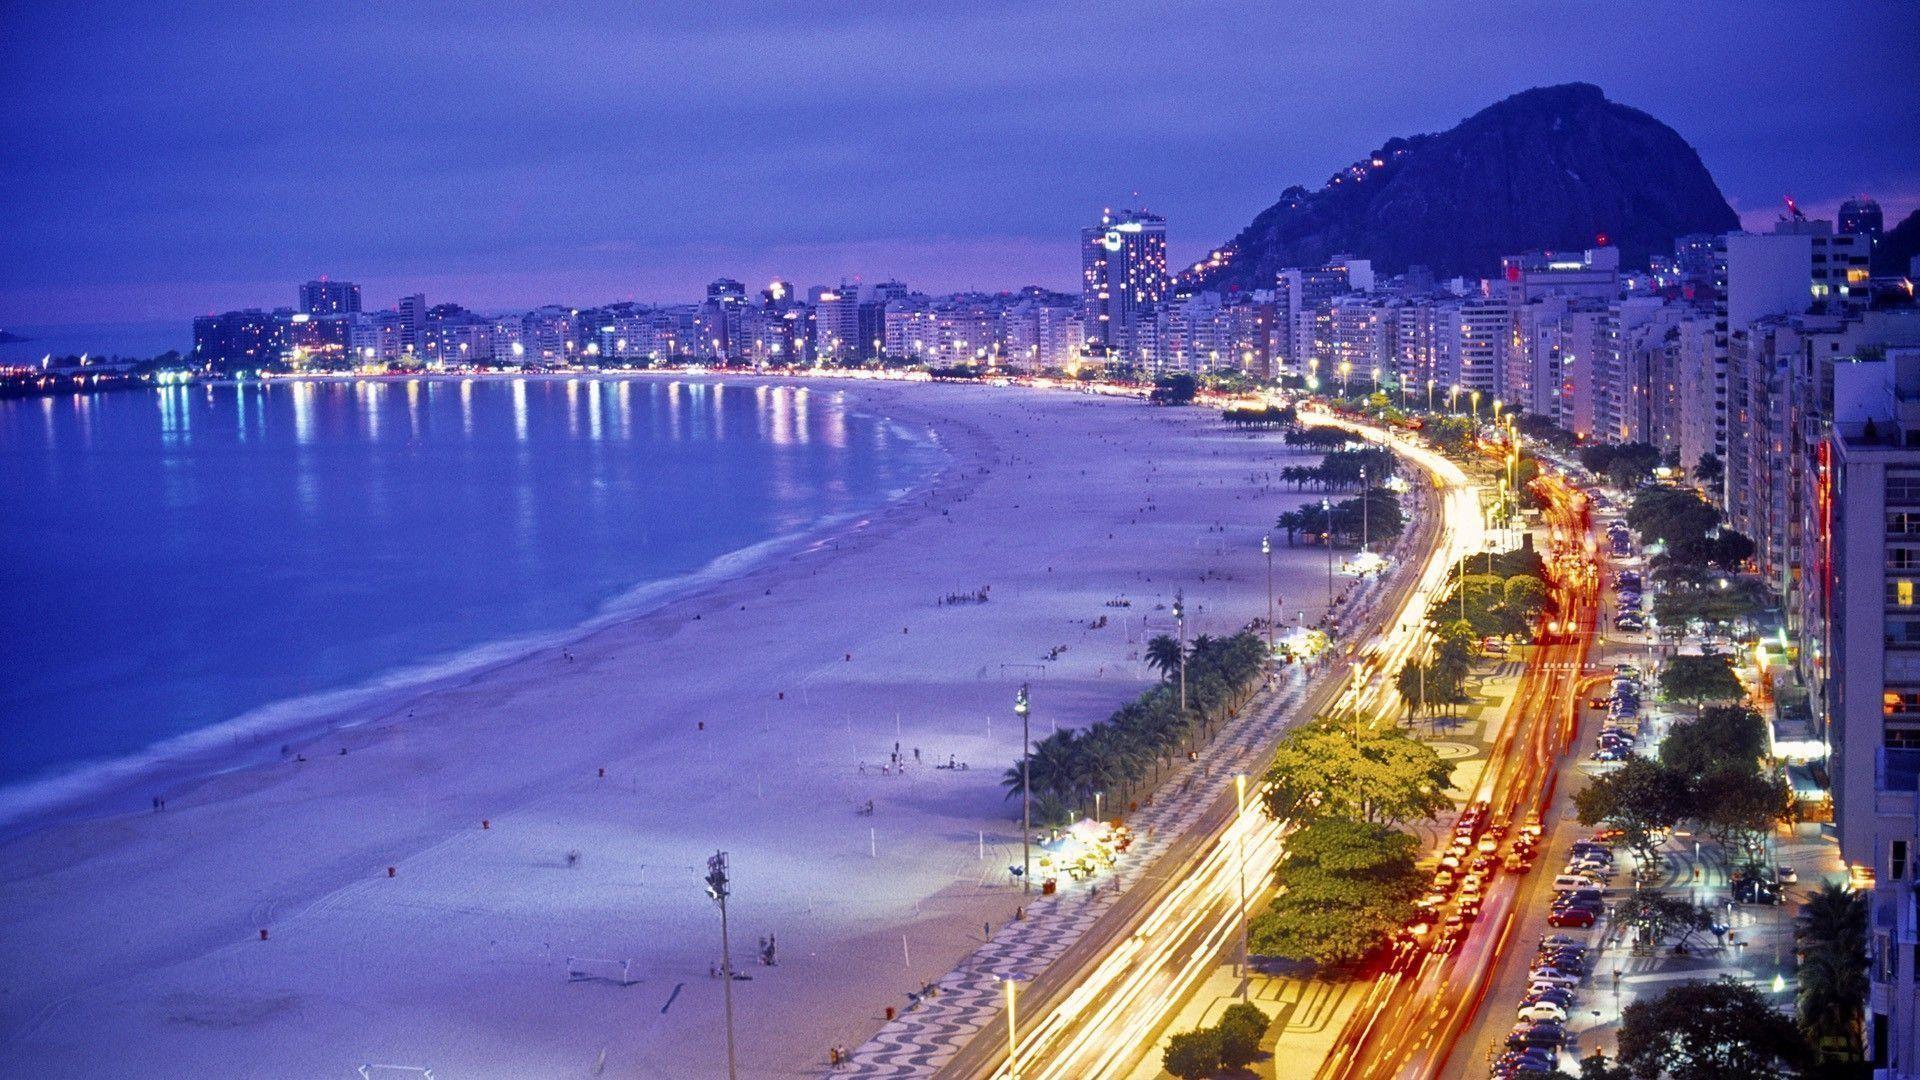 Rio de Janeiro Beach Night Wallpaper – Free Download Wallpaper .